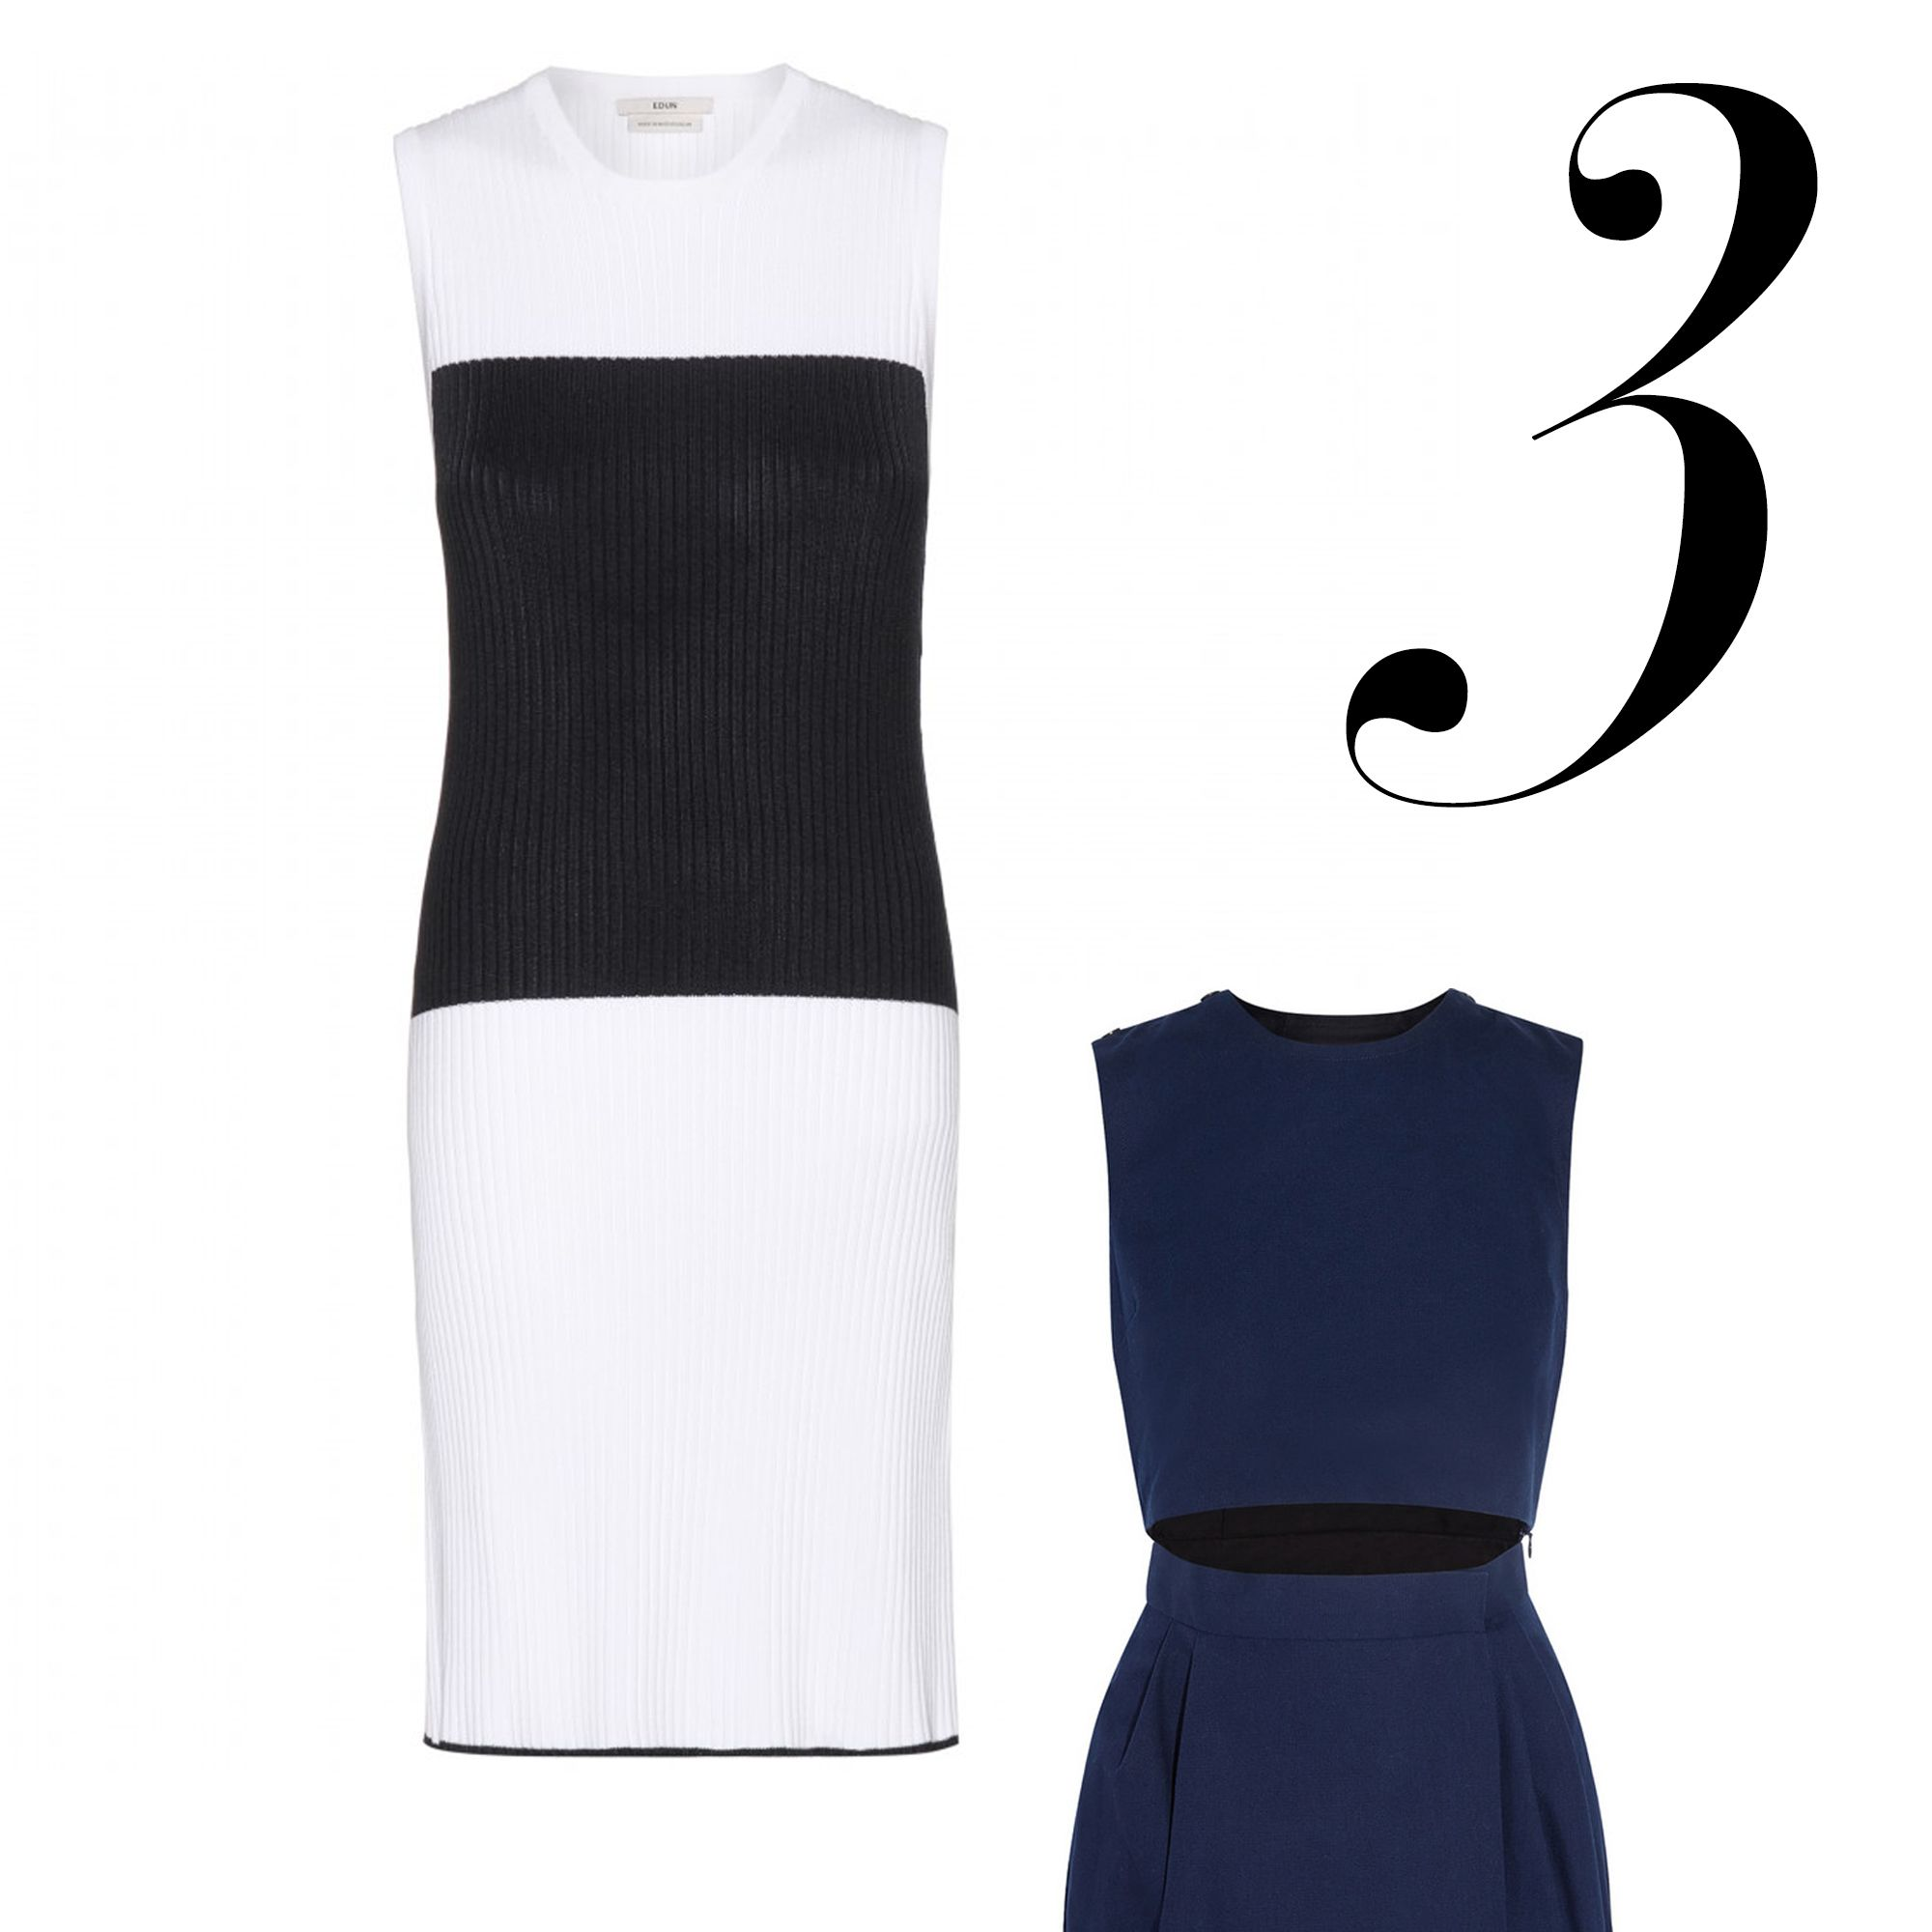 "<div>Feeling shifty? Opt for ones with added interest like graphic-blocking and peek-a-boo cut-outs.</div><div></div><div><em>Edun, $591, <a target=""_blank"" href=""http://www.mytheresa.com/en-us/ribbed-cotton-dress.html"">mytheresa.com</a>&#x3B;</em><em>Victoria Beckham, $1,495, <a target=""_blank"" href=""http://www.net-a-porter.com/us/en/product/535279"">net-a-porter.com</a>.</em></div>"